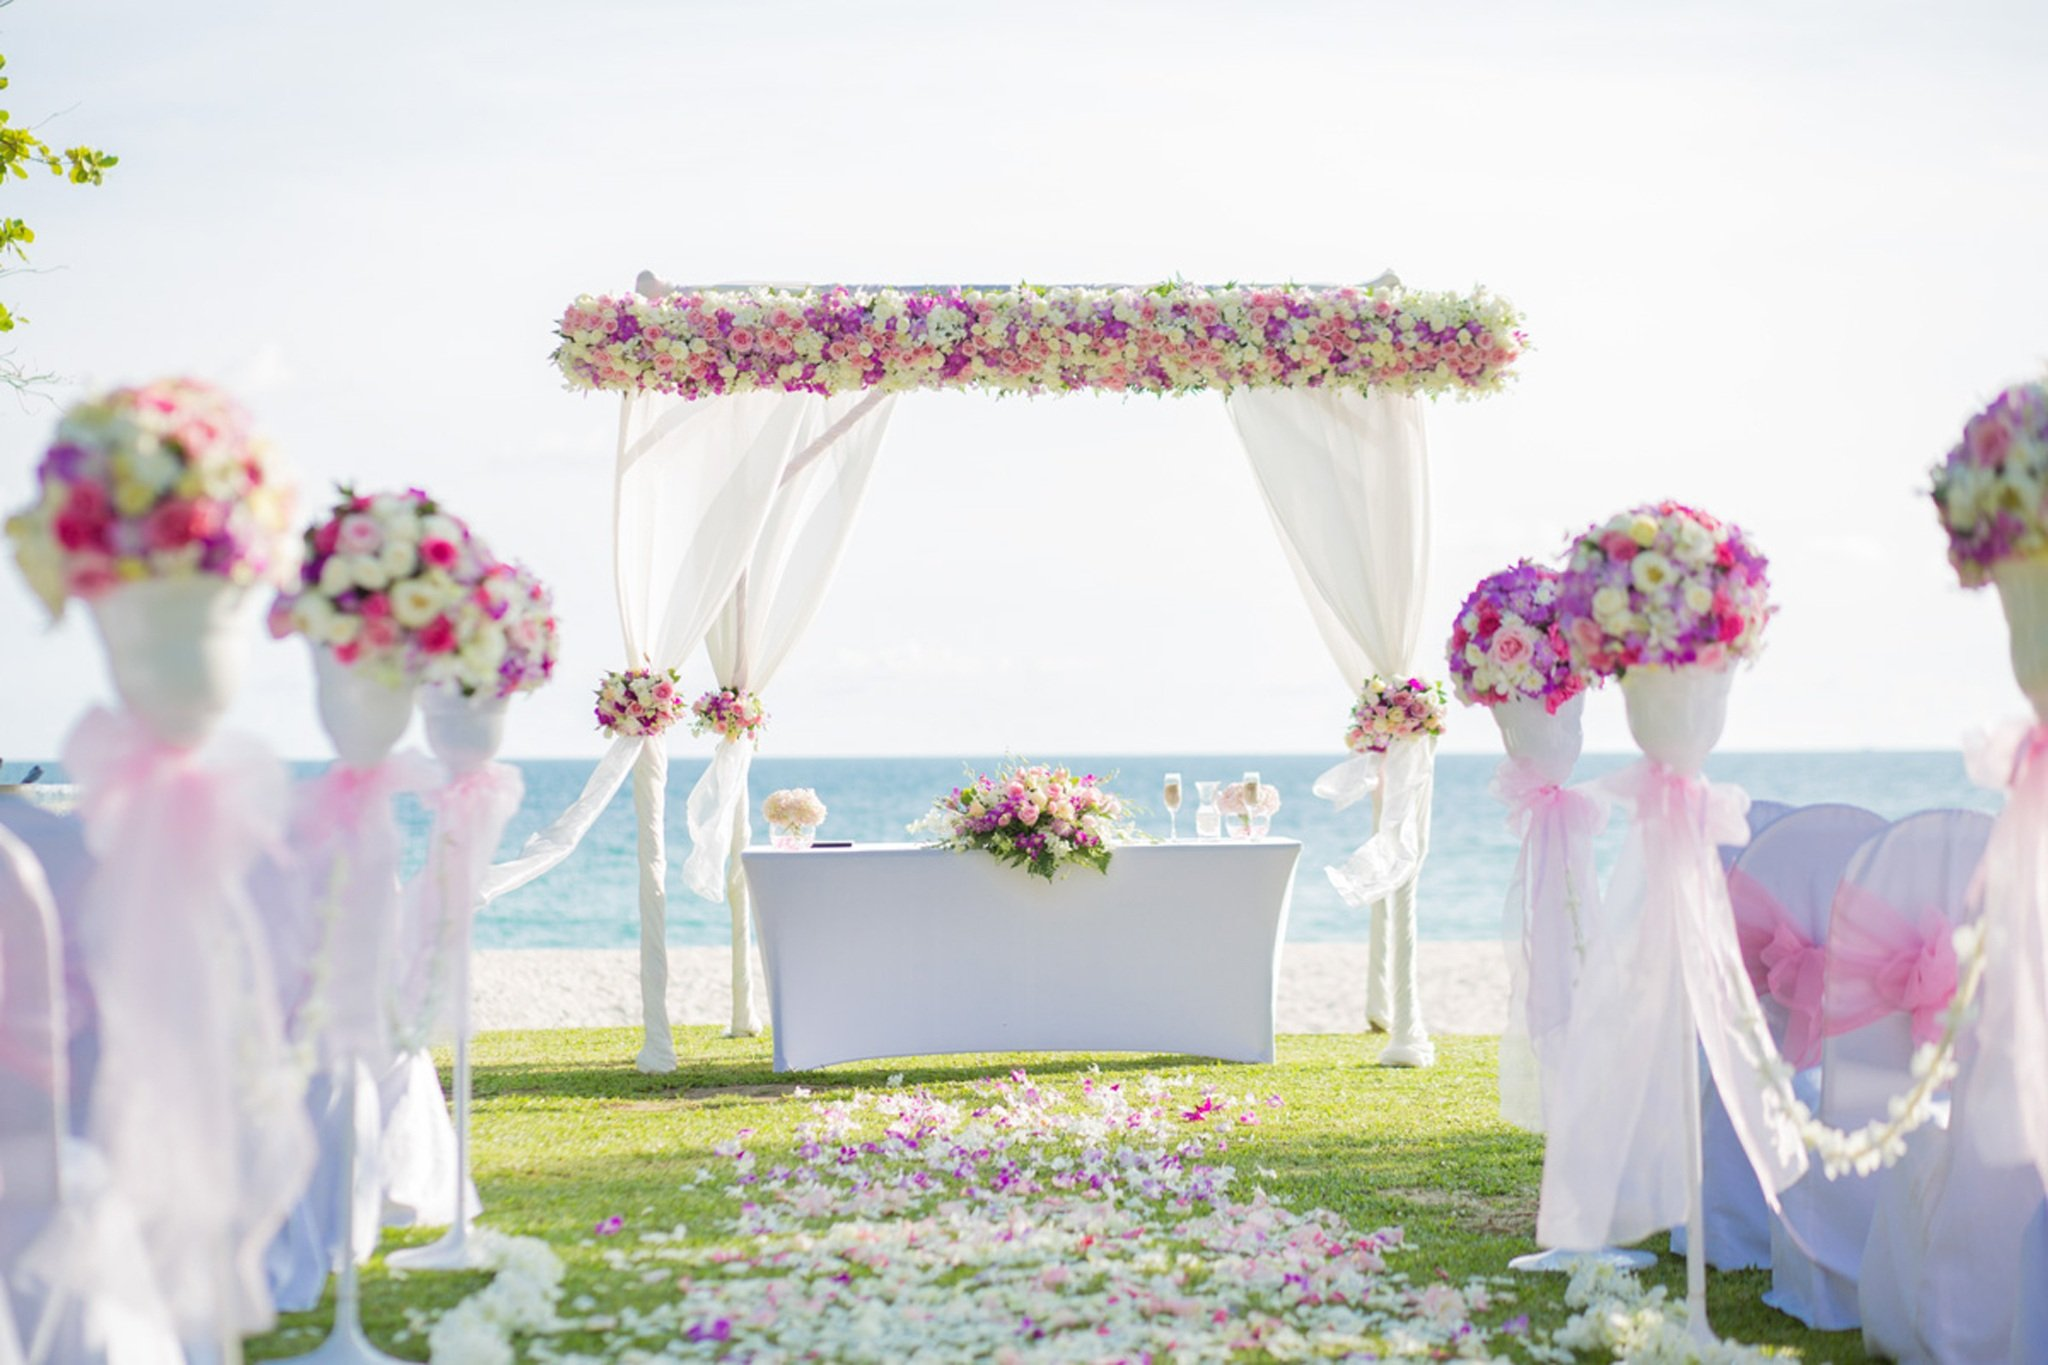 Nigerian wedding on Saturday